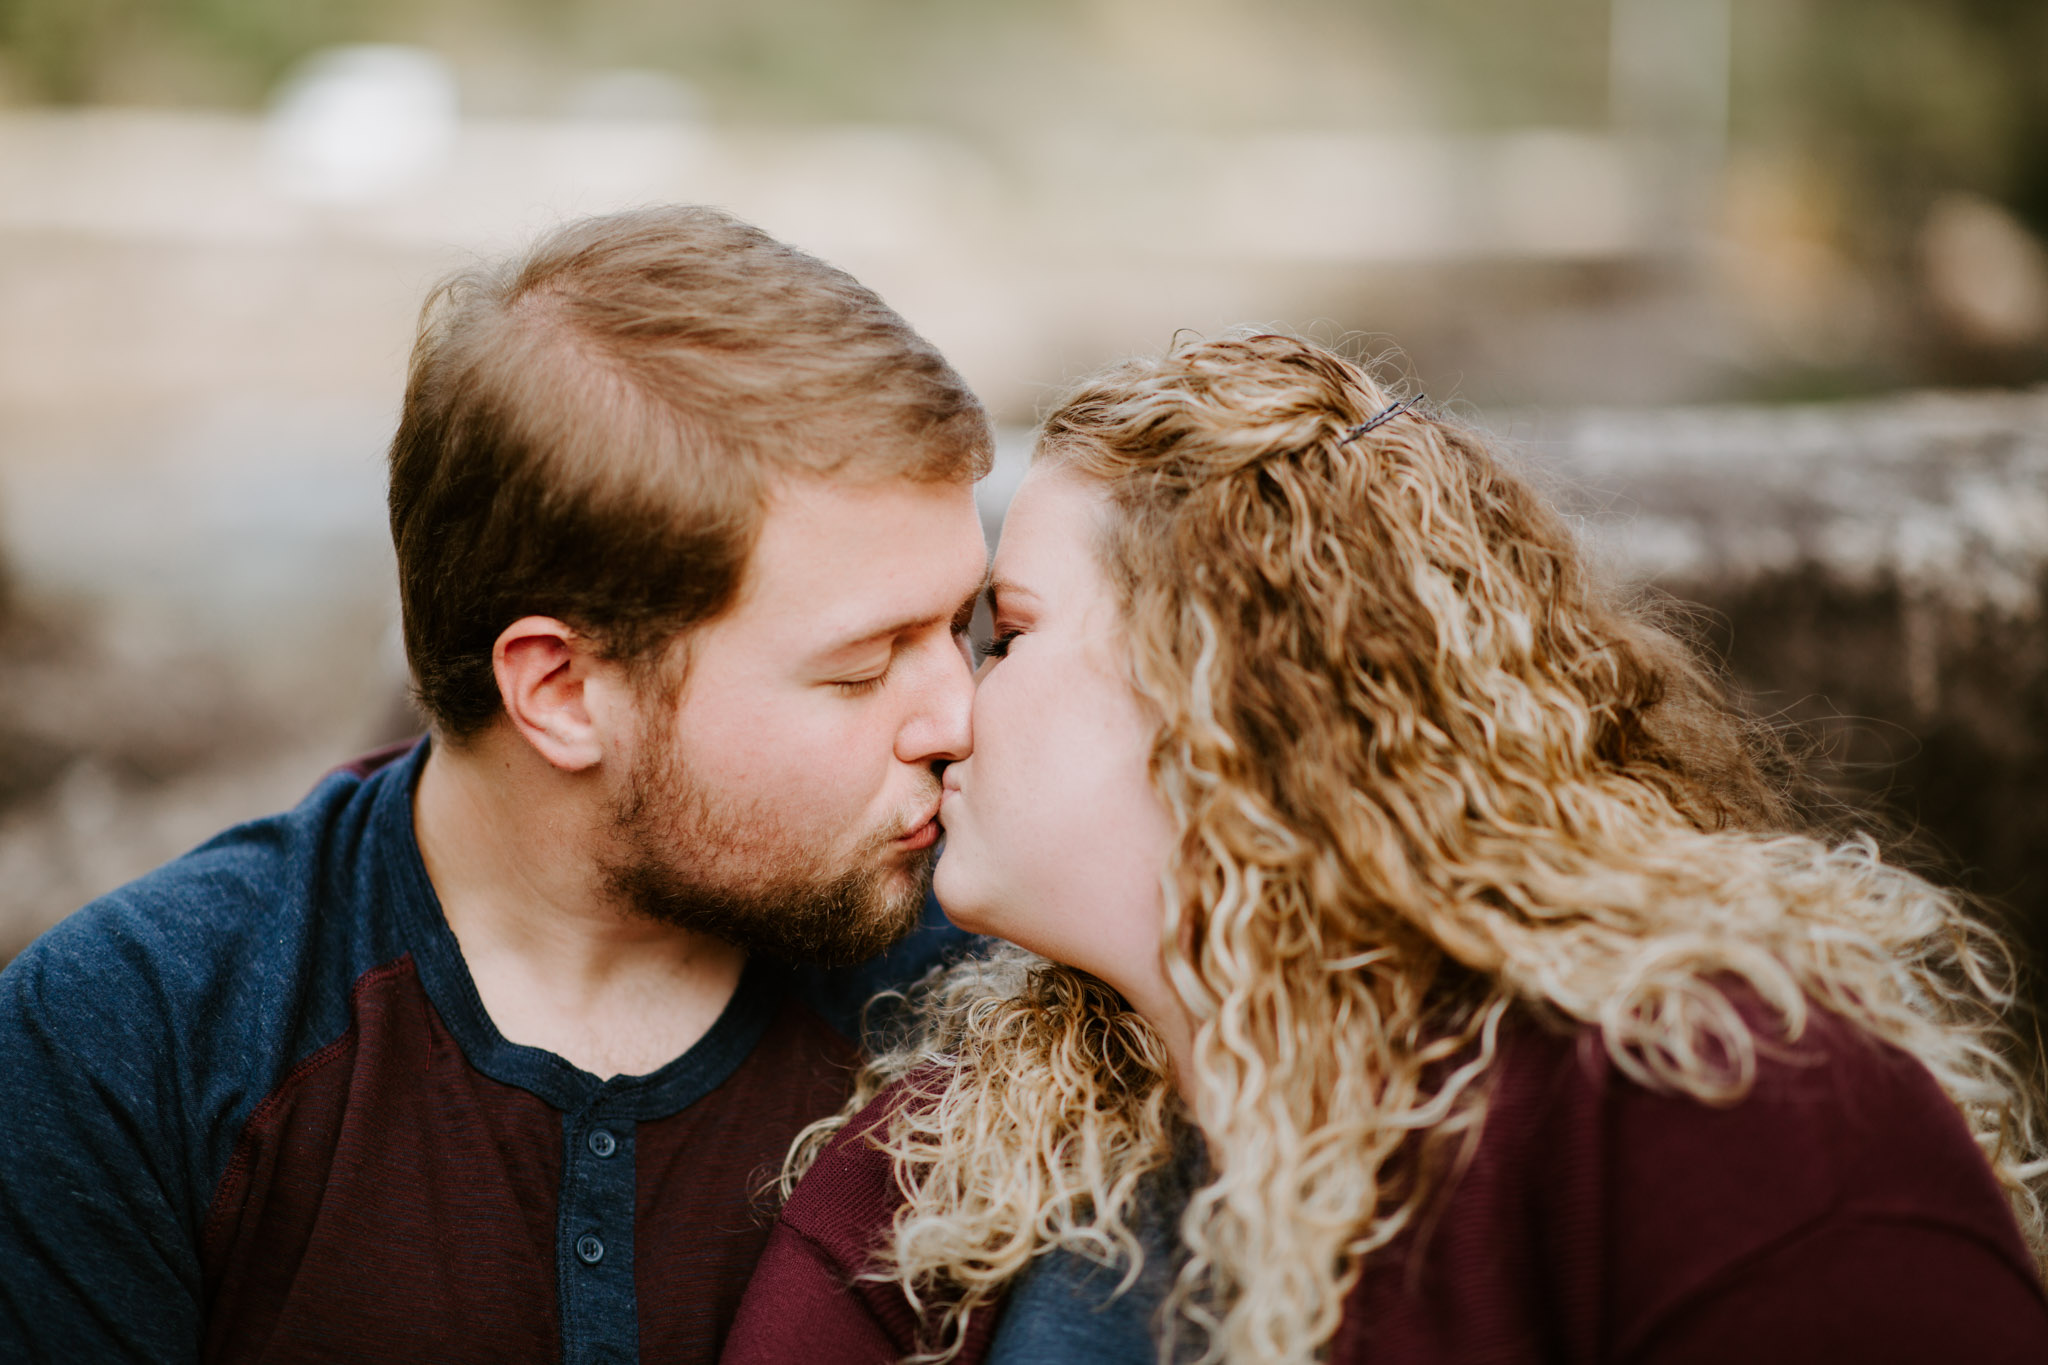 Kaitlin + Blake + Chattanooga + Tennessee + Engagement + Ocoee River + Wedding + Photographer-47.jpg